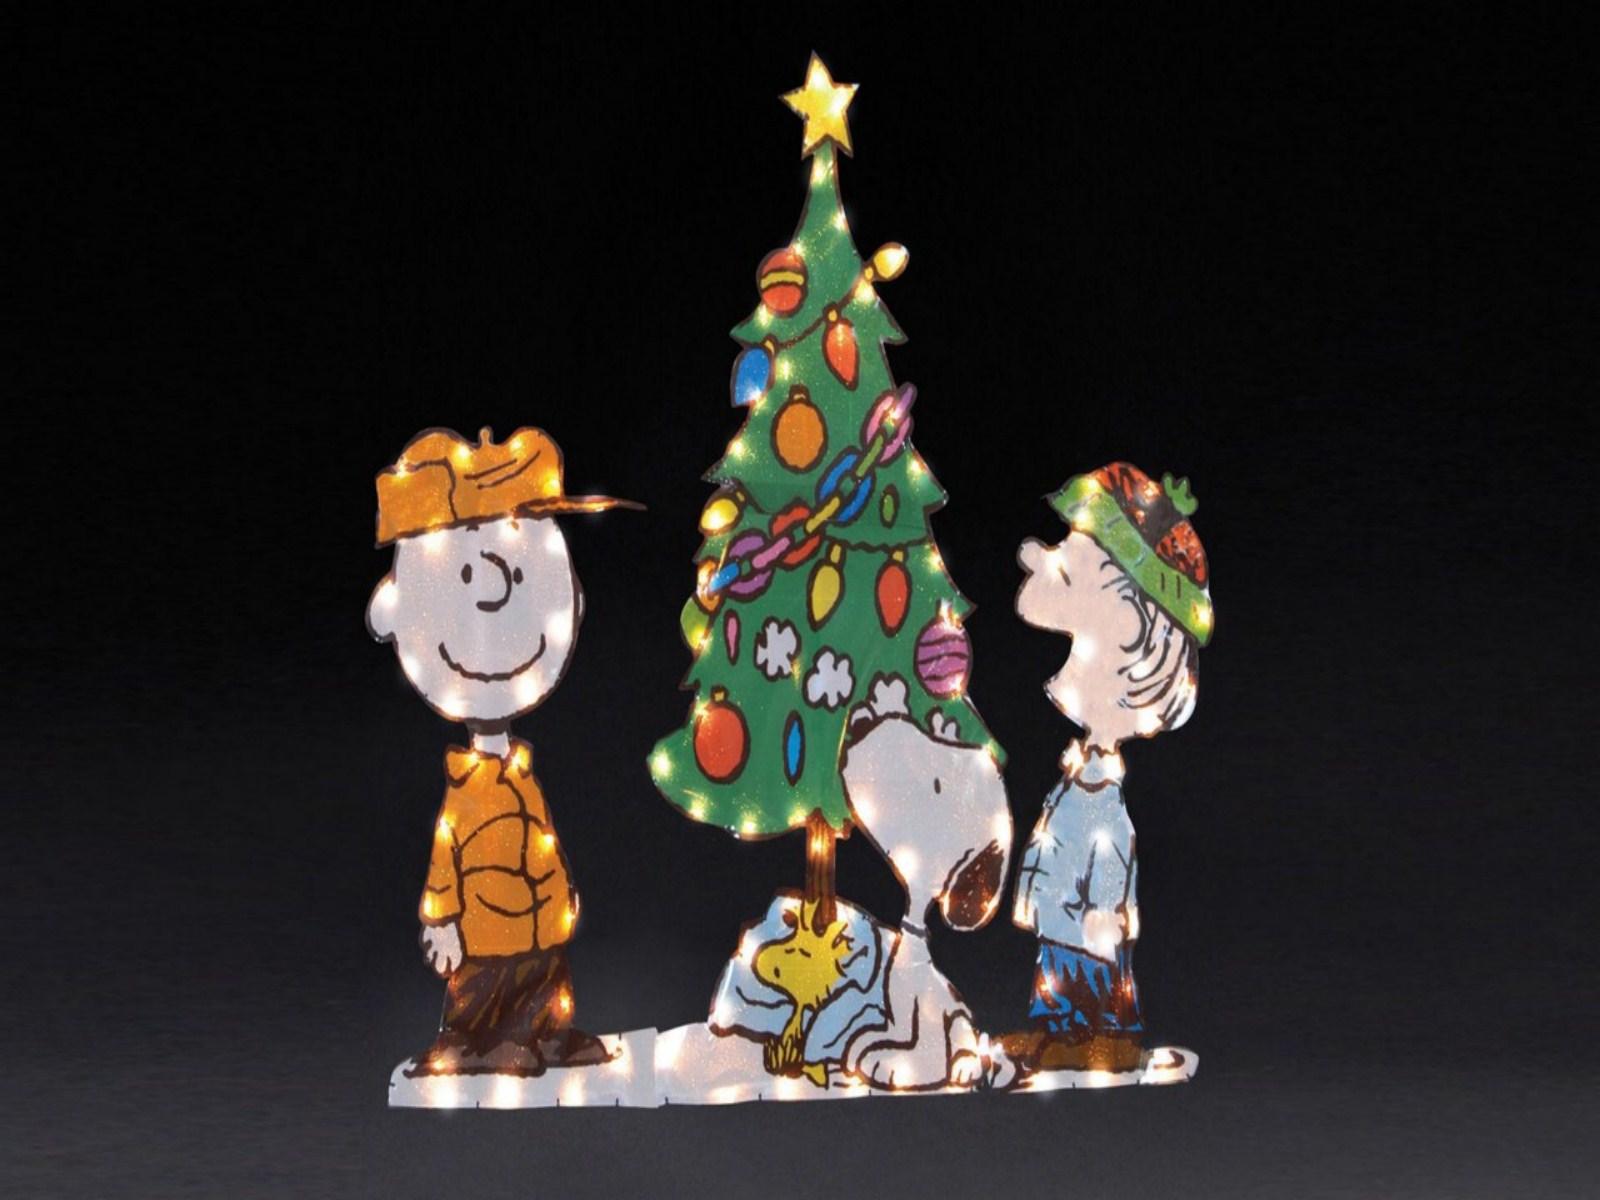 CHARLIE BROWN peanuts comics snoopy christmas f wallpaper 1600x1200 1600x1200